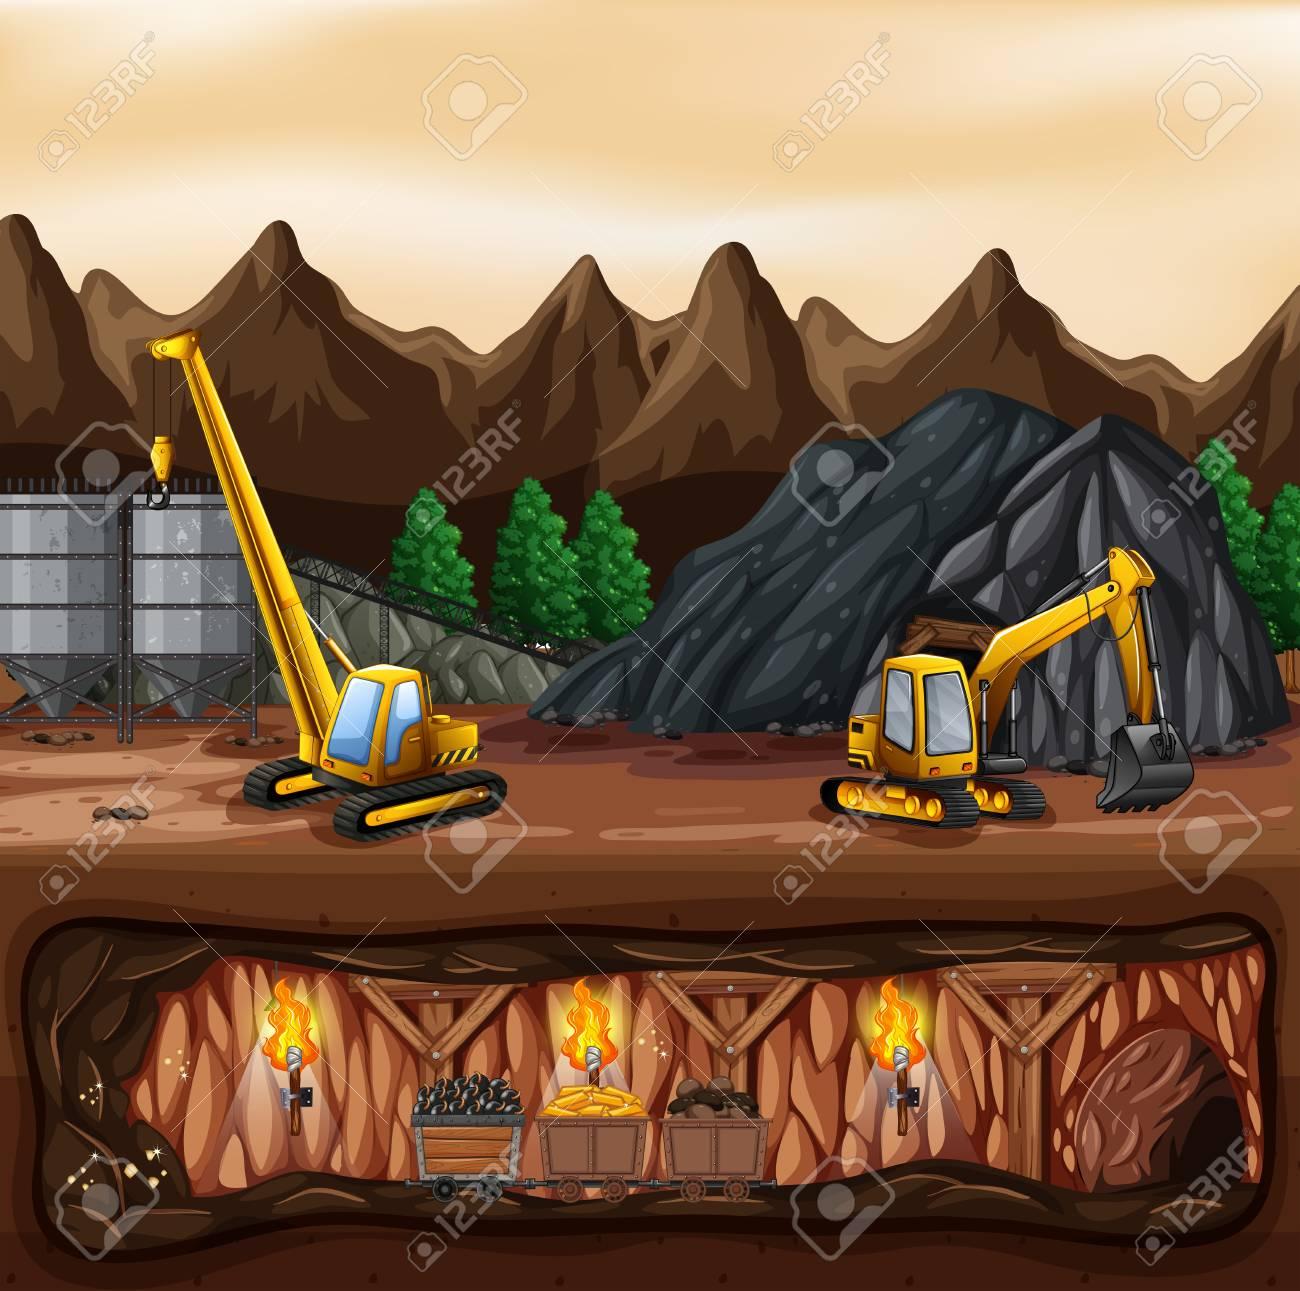 A coal mine landscape illustration - 106580964